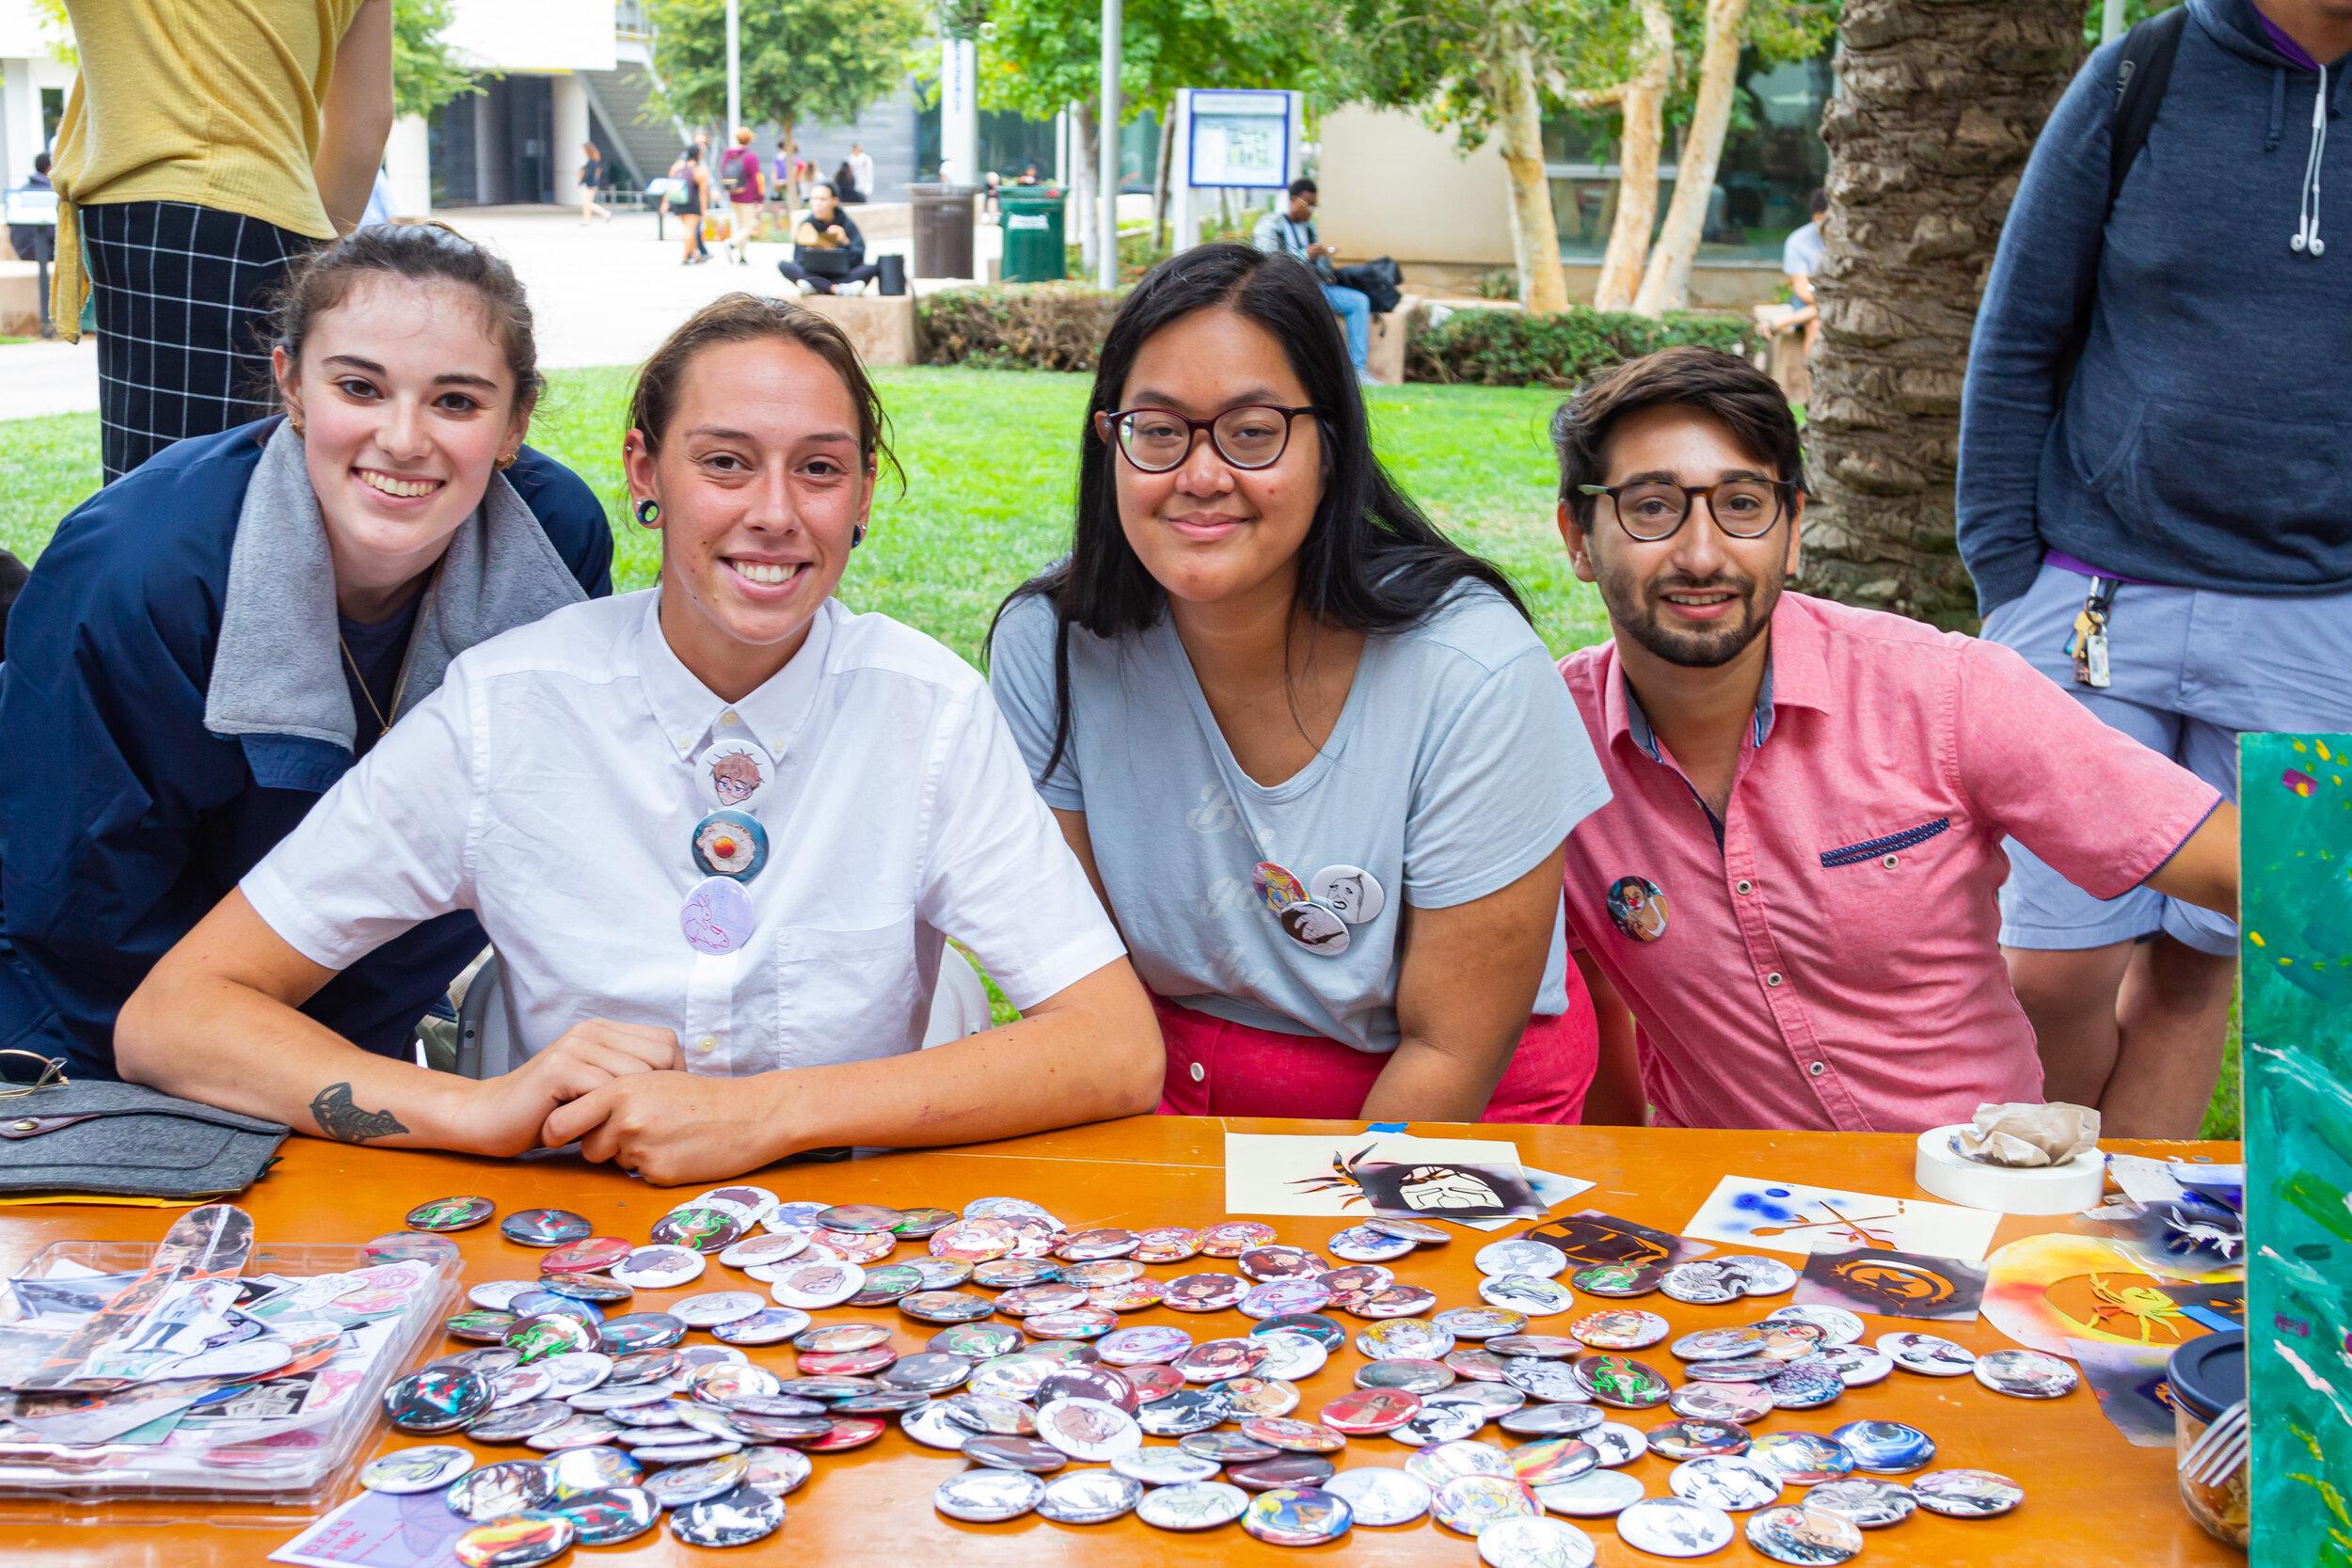 Students celebrate the Santa Monica College (SMC) Club Fair on the SMC main campus, in Santa Monica, Calif. on Thursday, September 26th 2019. (Marco Pallotti/The Corsair)